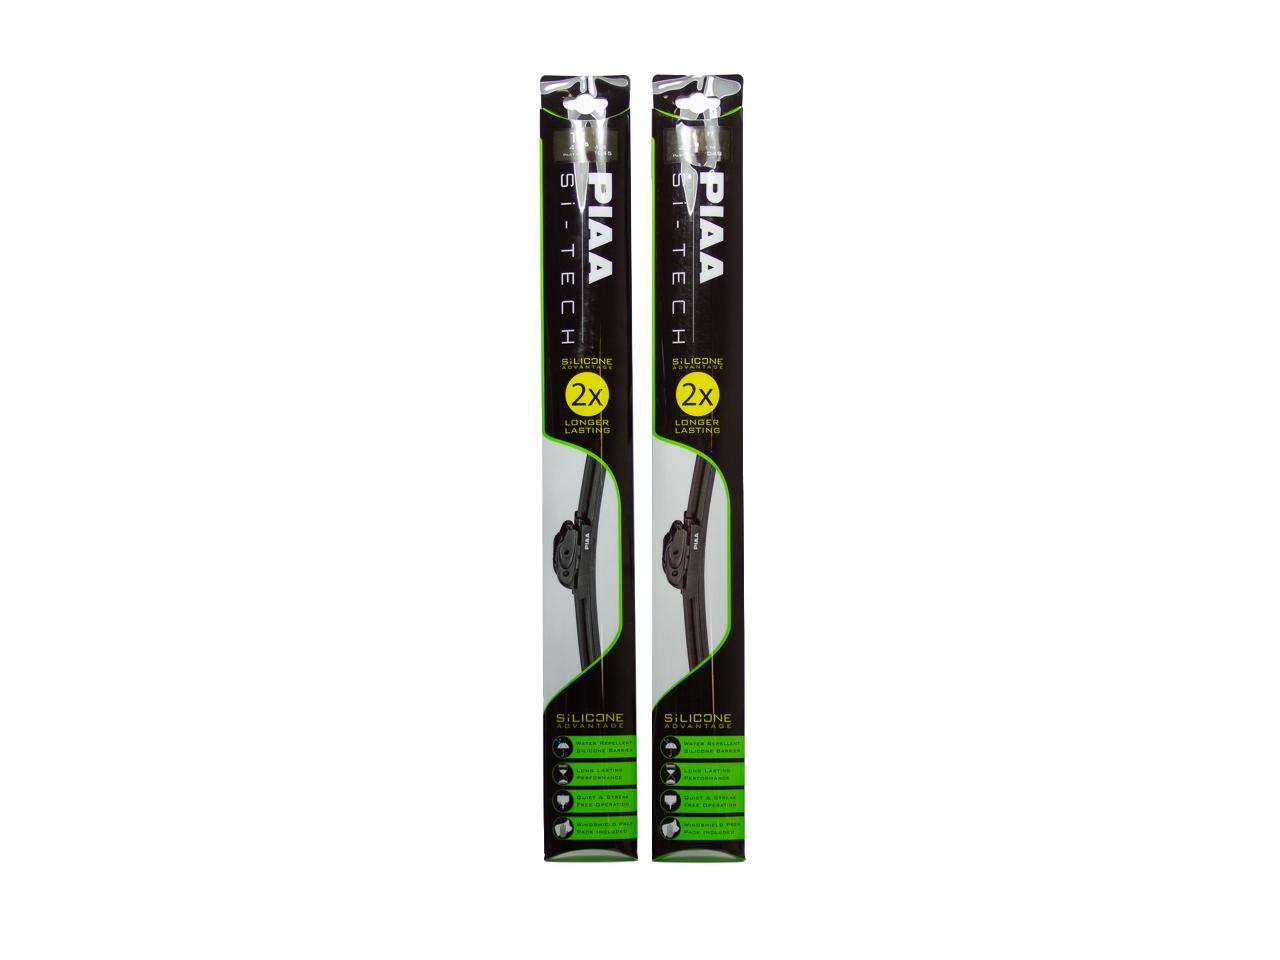 Groovy Piaa Si Tech Wiper Blade Kit Push Button Arm Style Wiring 101 Orsalhahutechinfo